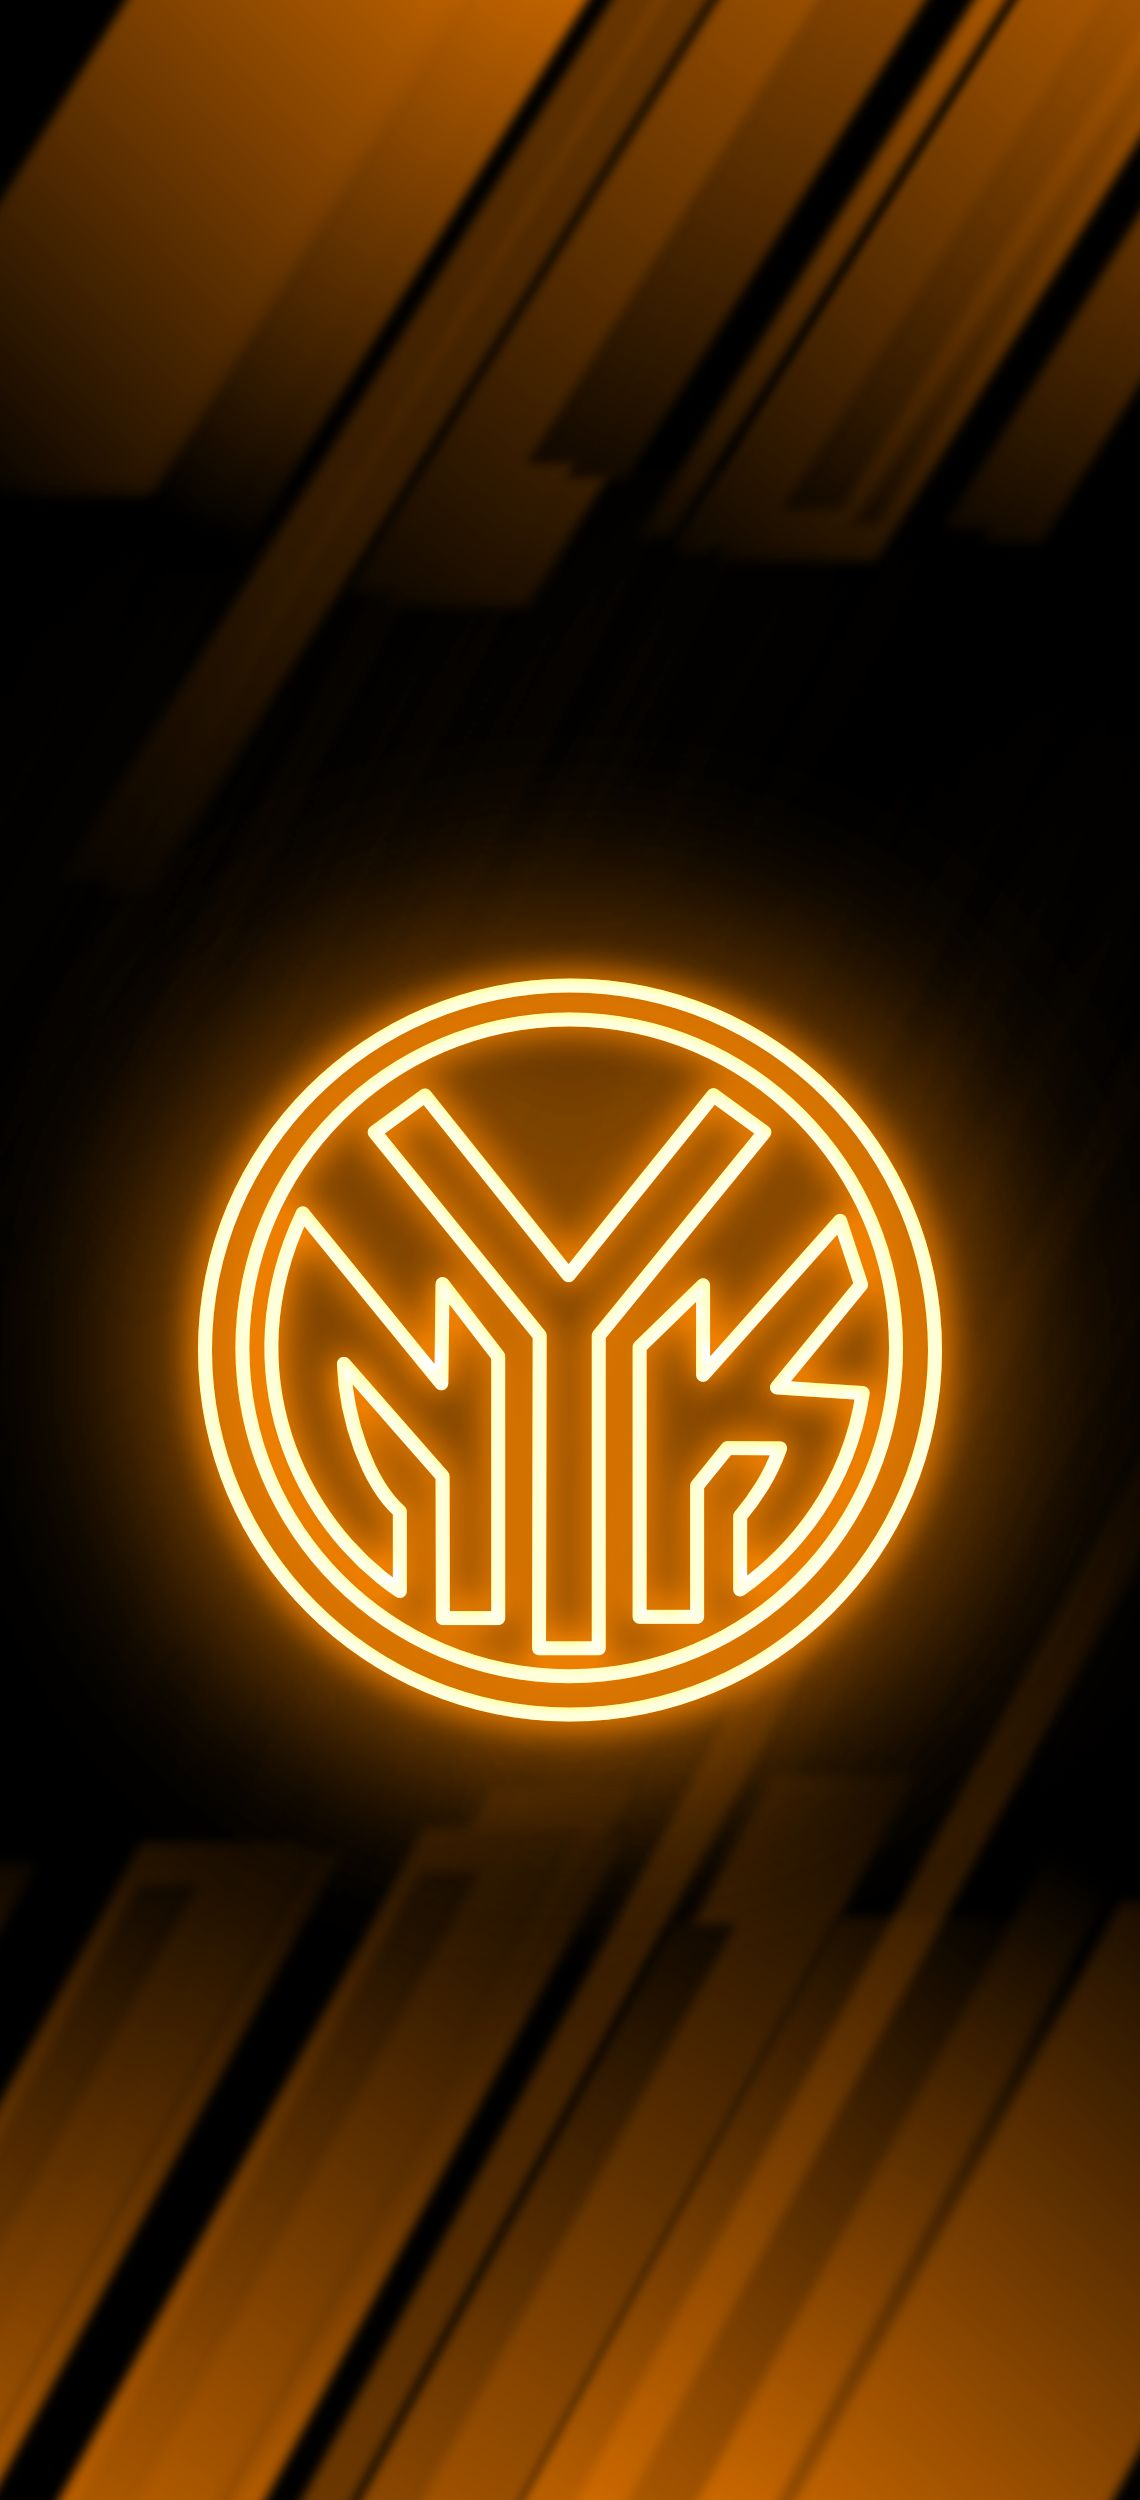 New York Knicks Neon Wallpaper Nba Wallpapers Knicks New York Knicks